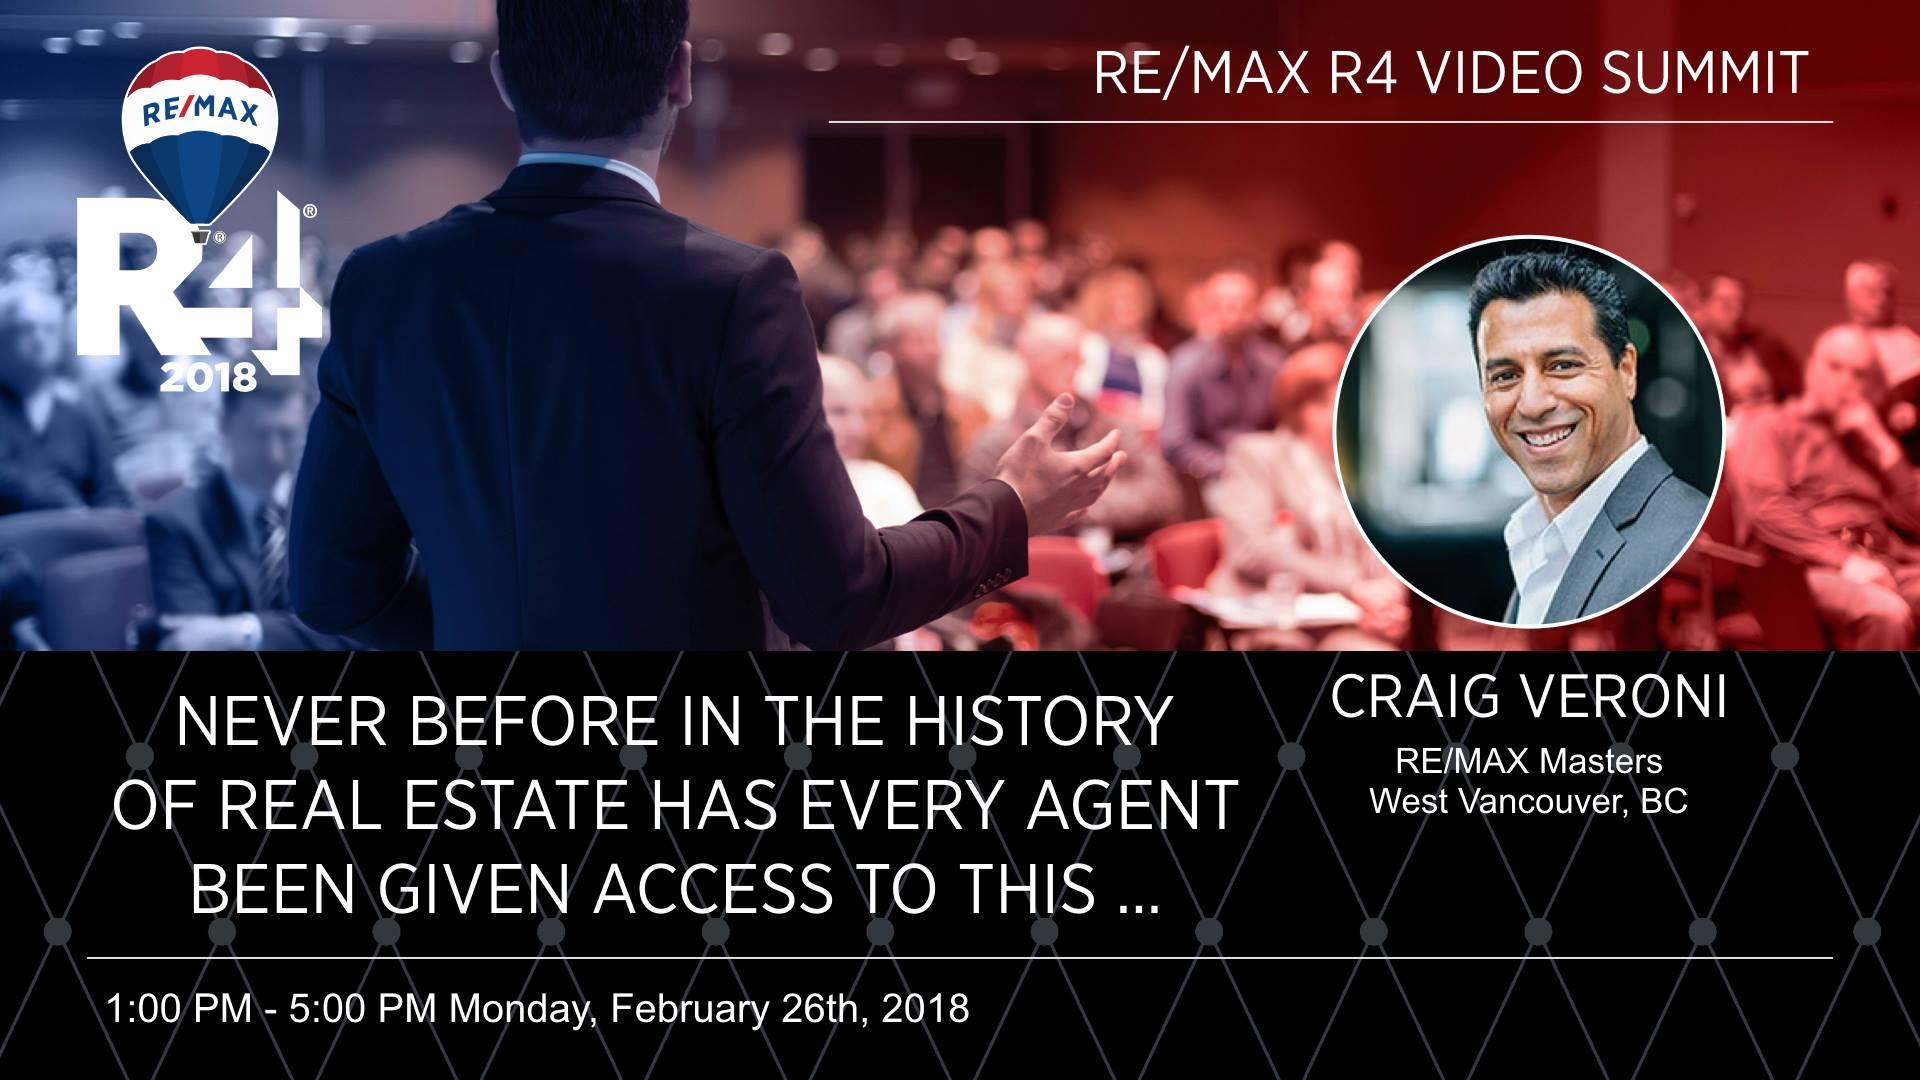 Craig Veroni RE/MAX R4 Summit - Vegas 2018